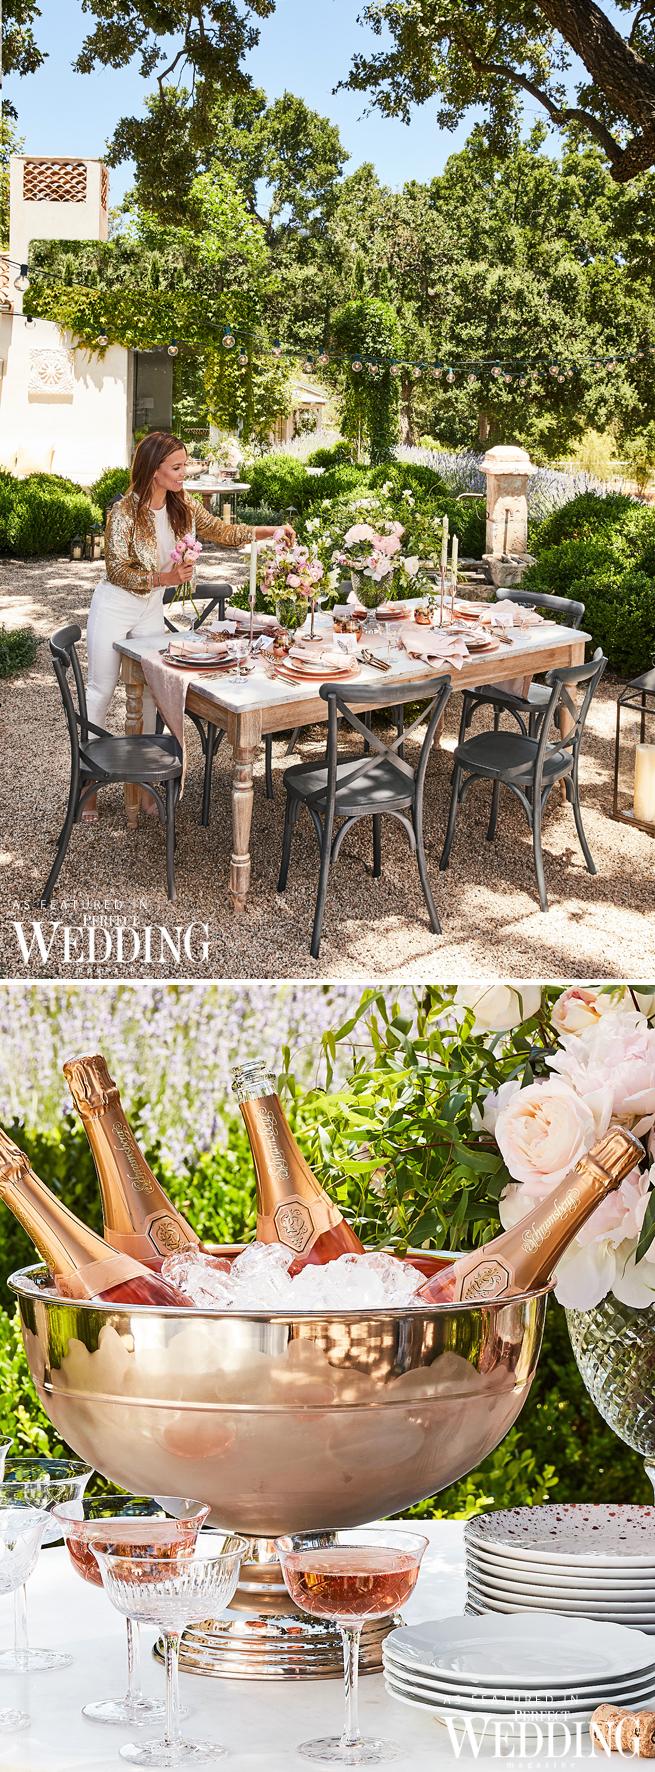 Bridal Registry, Monique Lhuillier, New York Bridal Market, Perfect Wedding Magazine, Perfect Wedding Blog, Monique Lhuillier for Pottery Barn, Wedding Registry